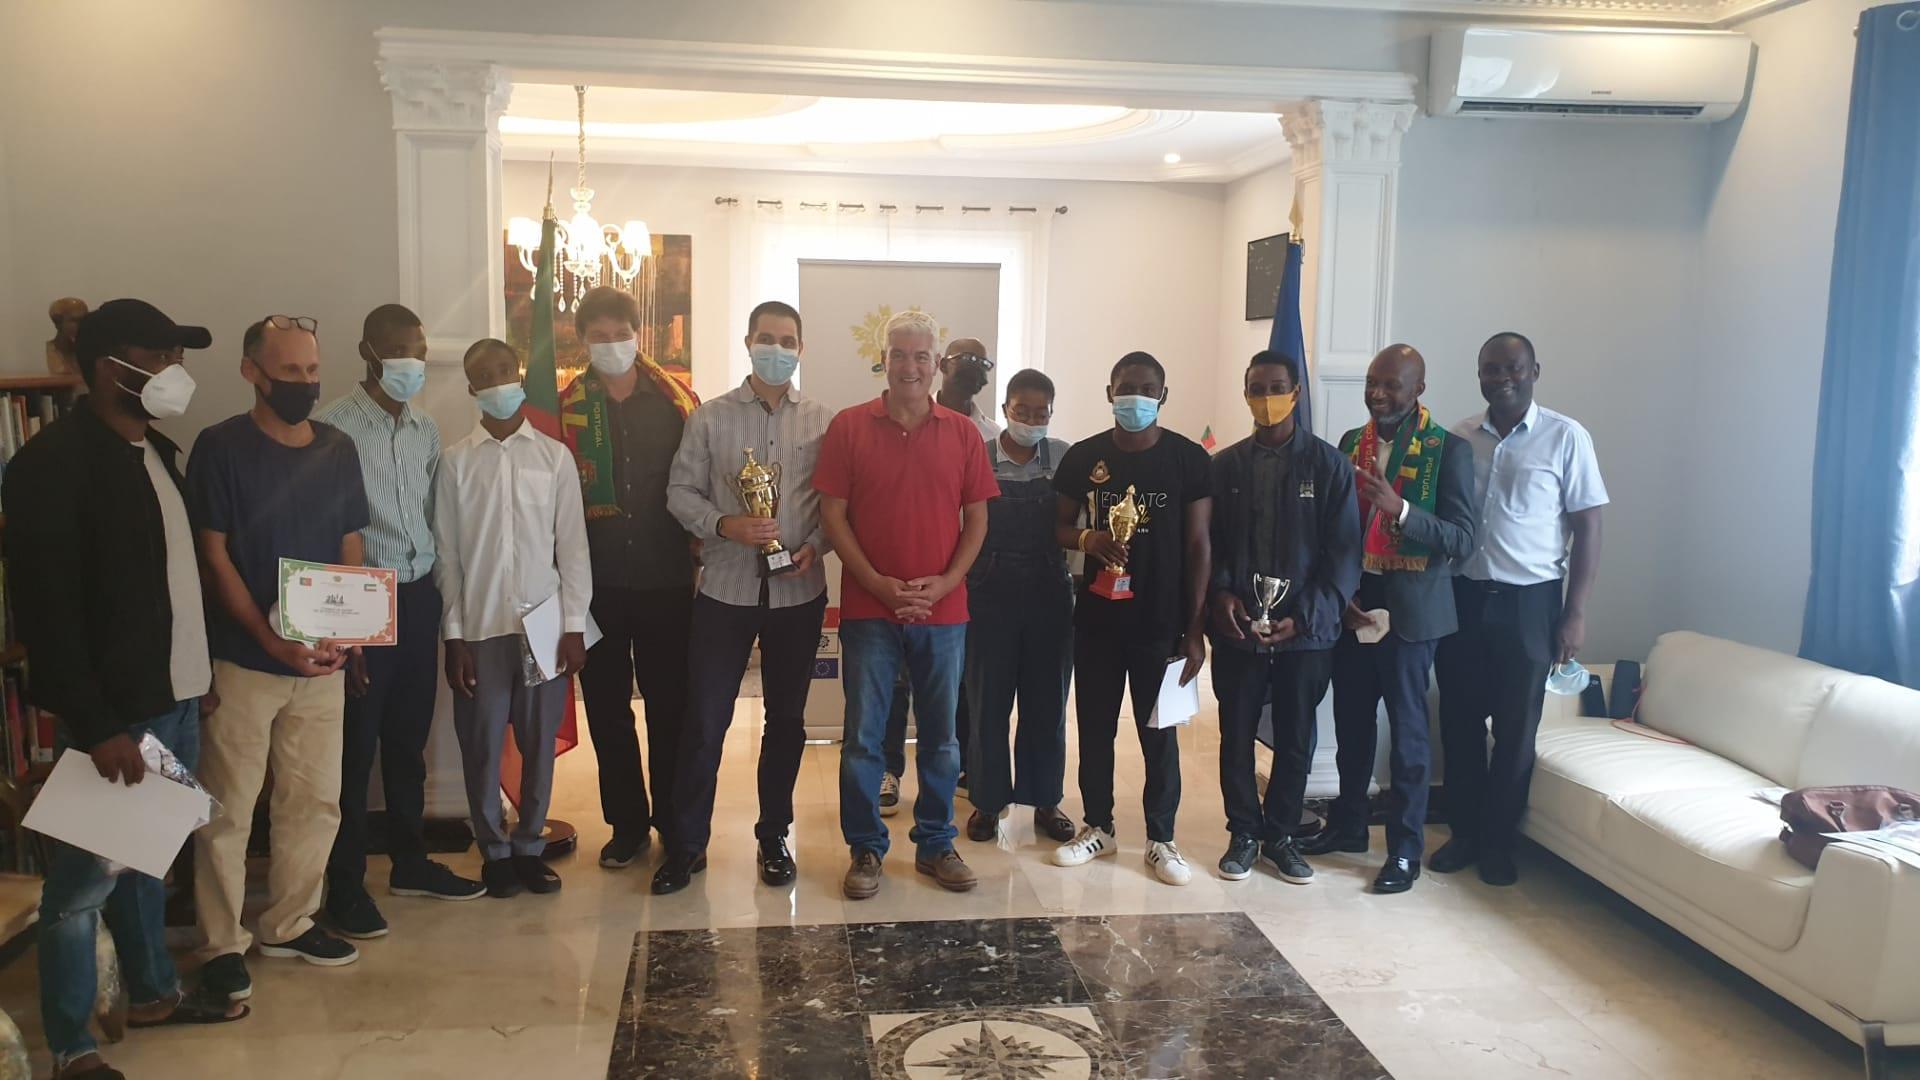 La Embajada de Portugal organiza un torneo de ajedrez